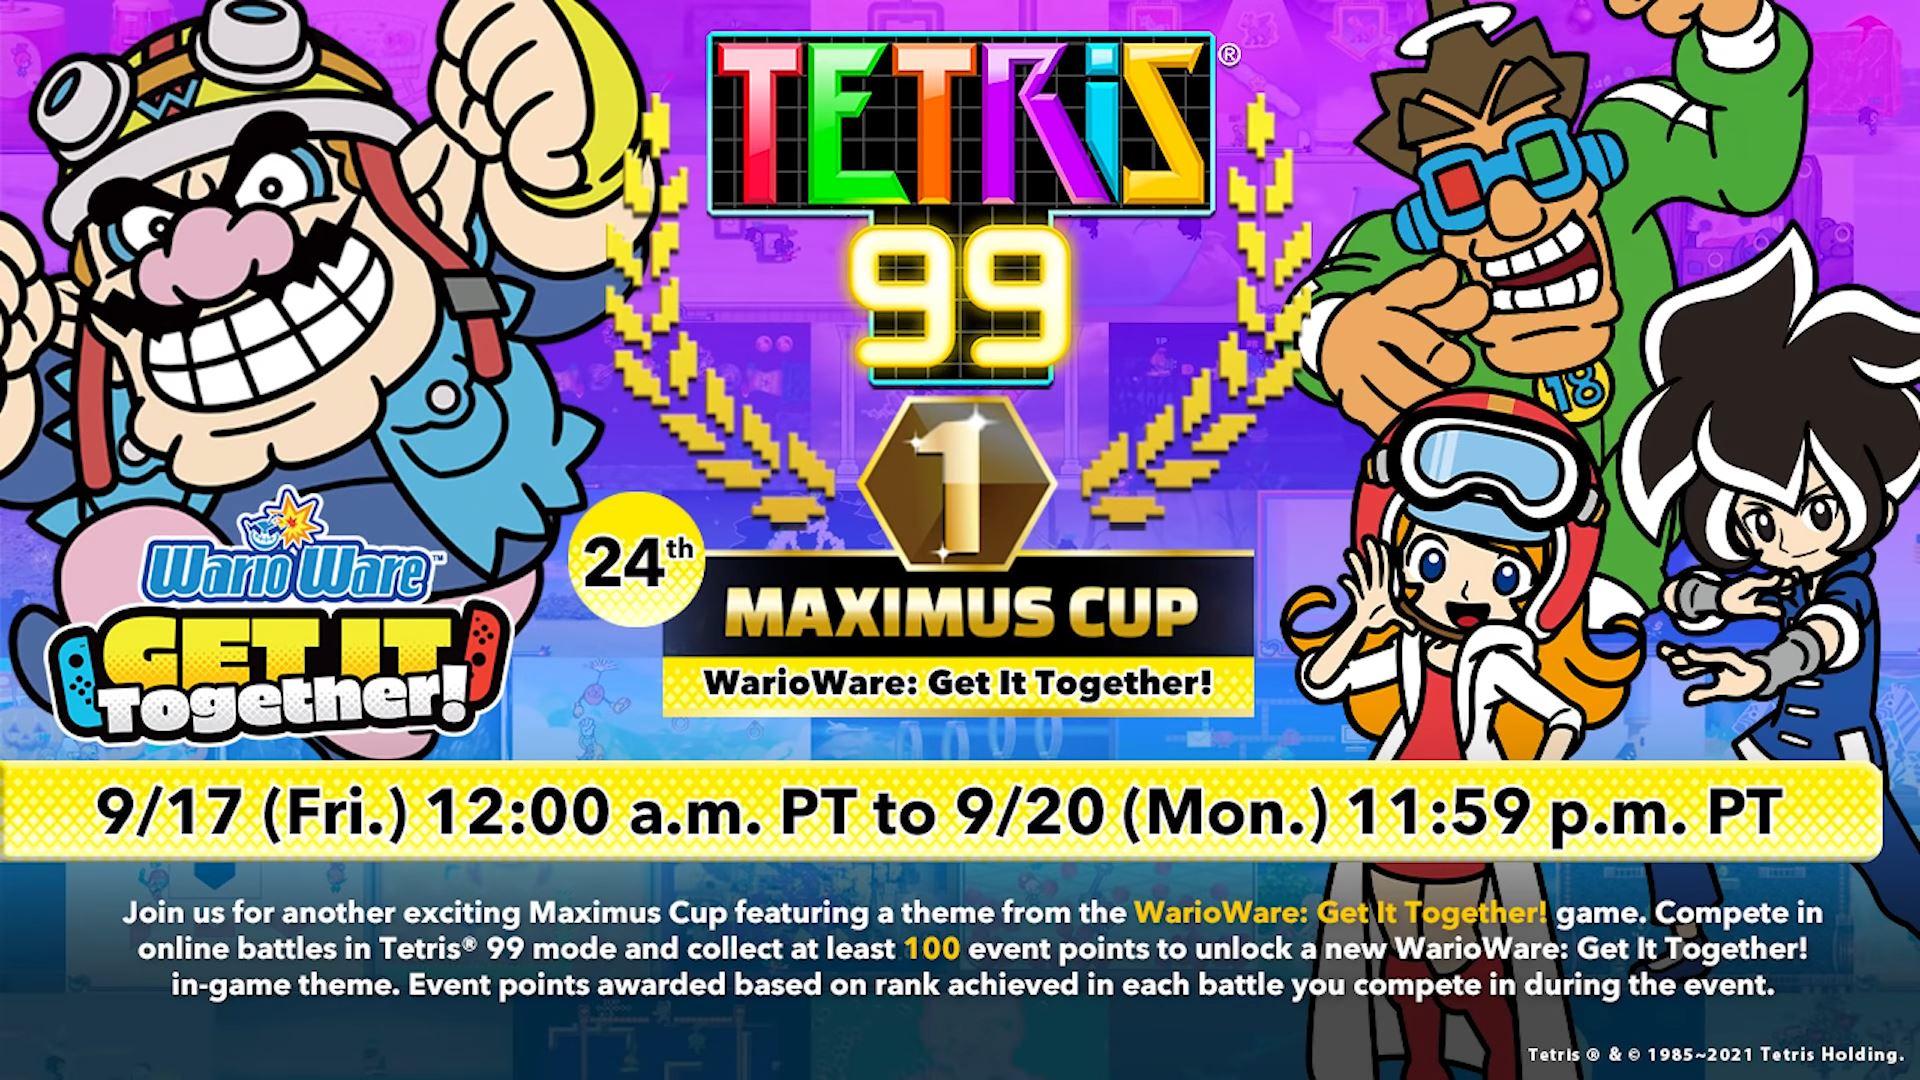 tetris 99 warioware maximus cup